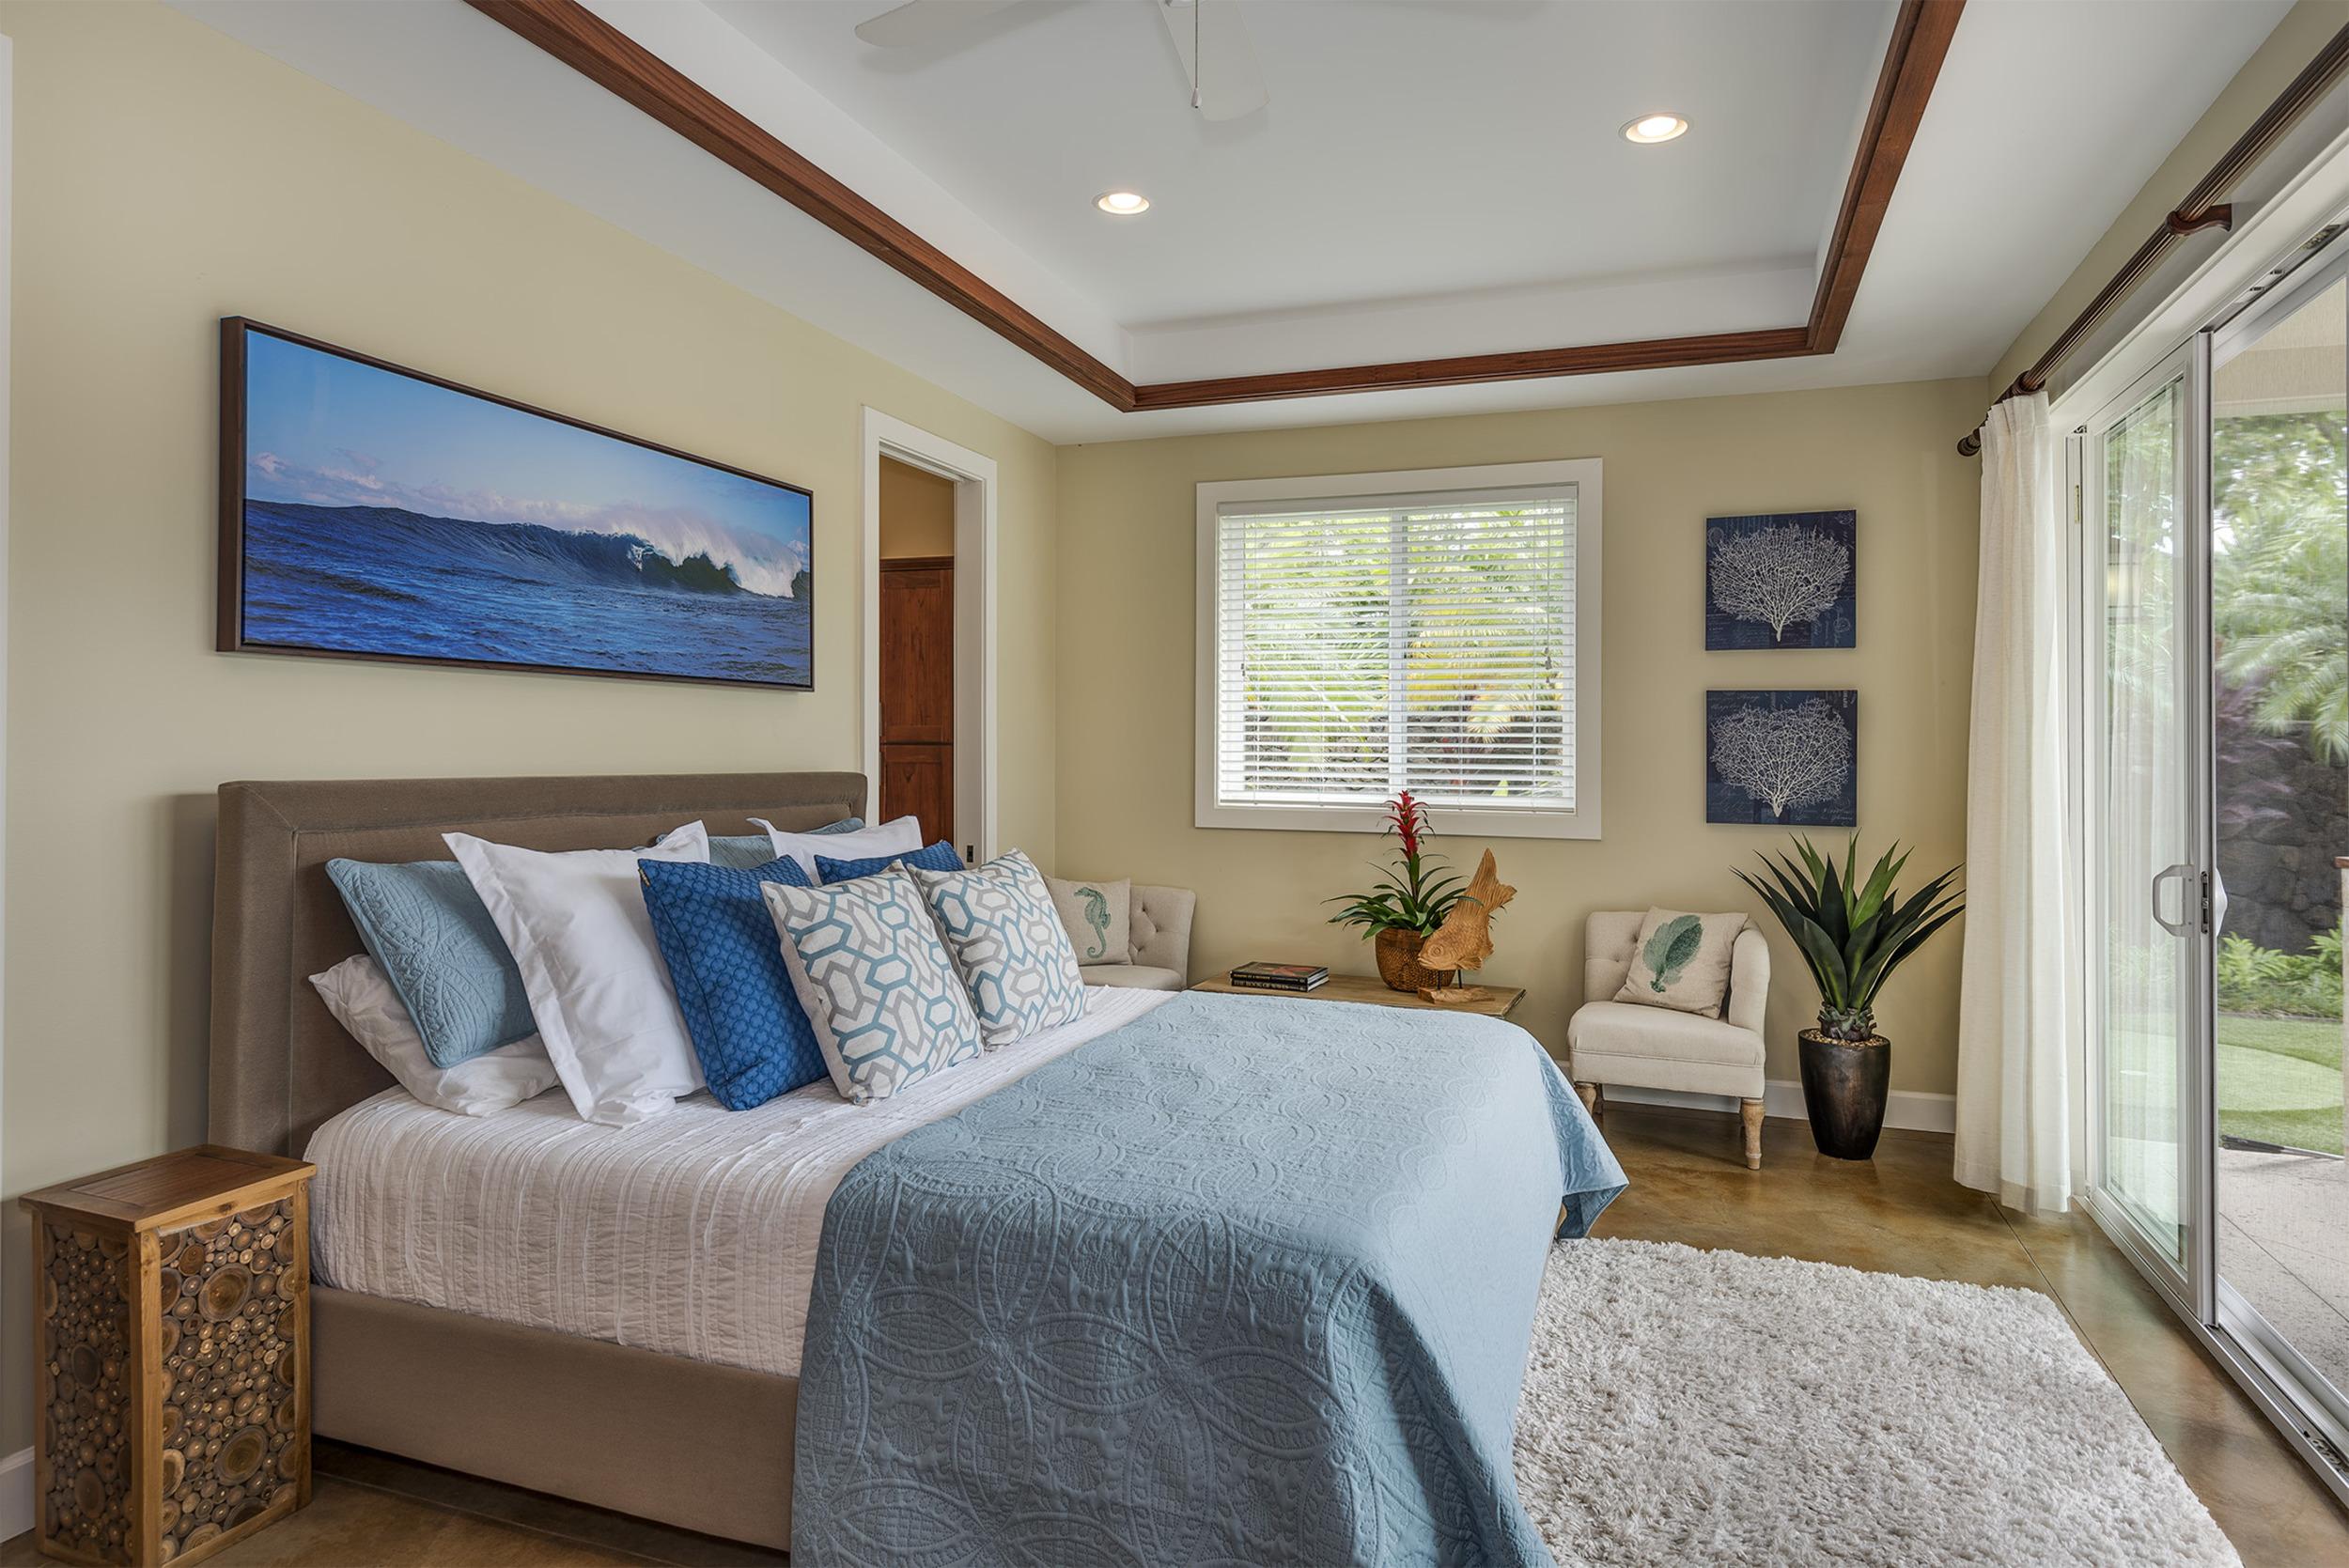 228 N. Kainalu Dr. Luxury Home Staging Hawaii, Home Staging Hawaii, Inouye Interiors LLC,Best Home Stagers Hawaii, Home Stagers in Hawaii, Stagers Hawaii, Home Stager Hawaii, Luxury Home Stager Hawaii